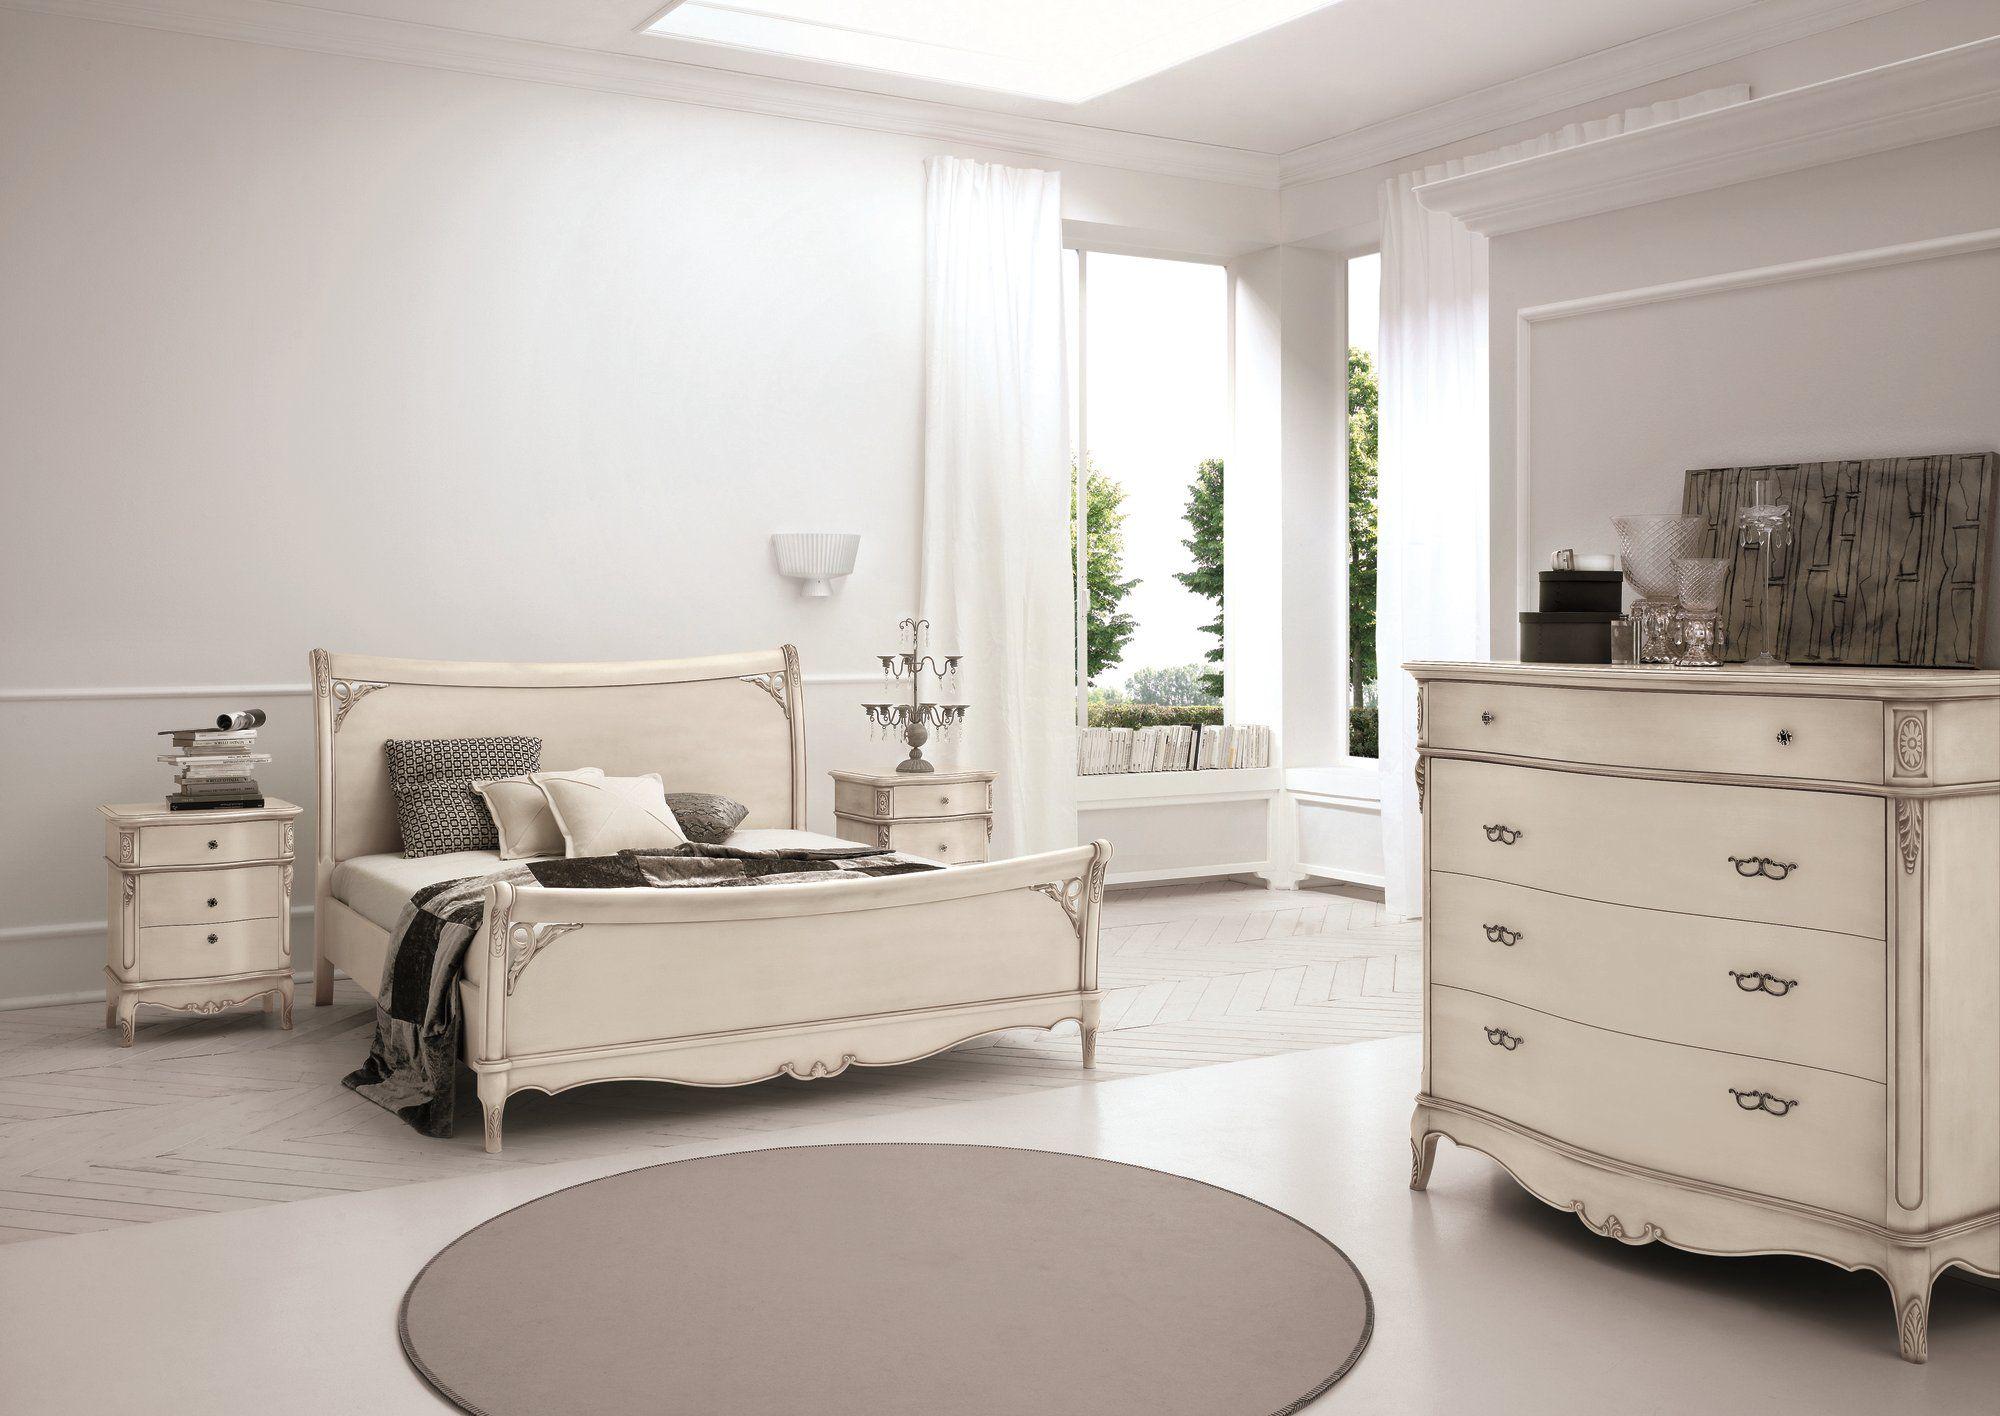 lampadari per camere : lampadari per camere da letto notali vendita online